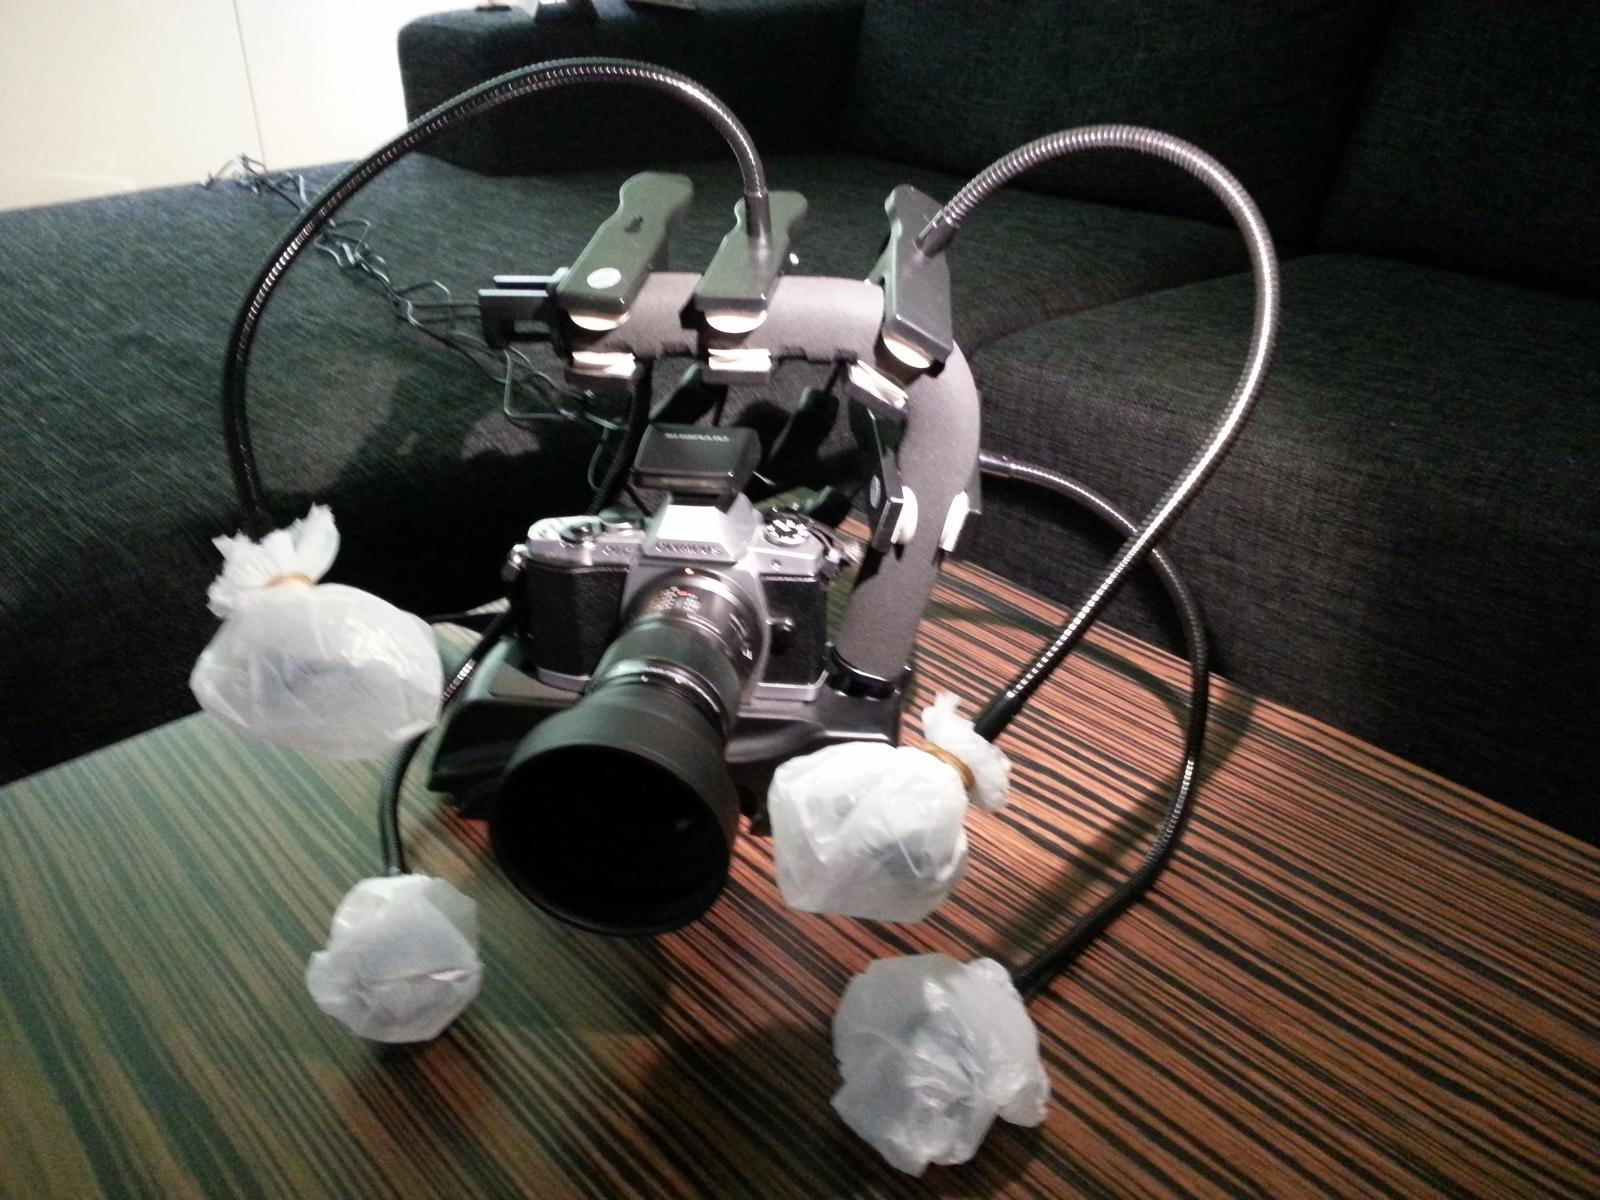 14820881230_cfaeed6cfb_o.jpg & IKEA lighting hack for macro photography (+ some pics) | UK ... azcodes.com